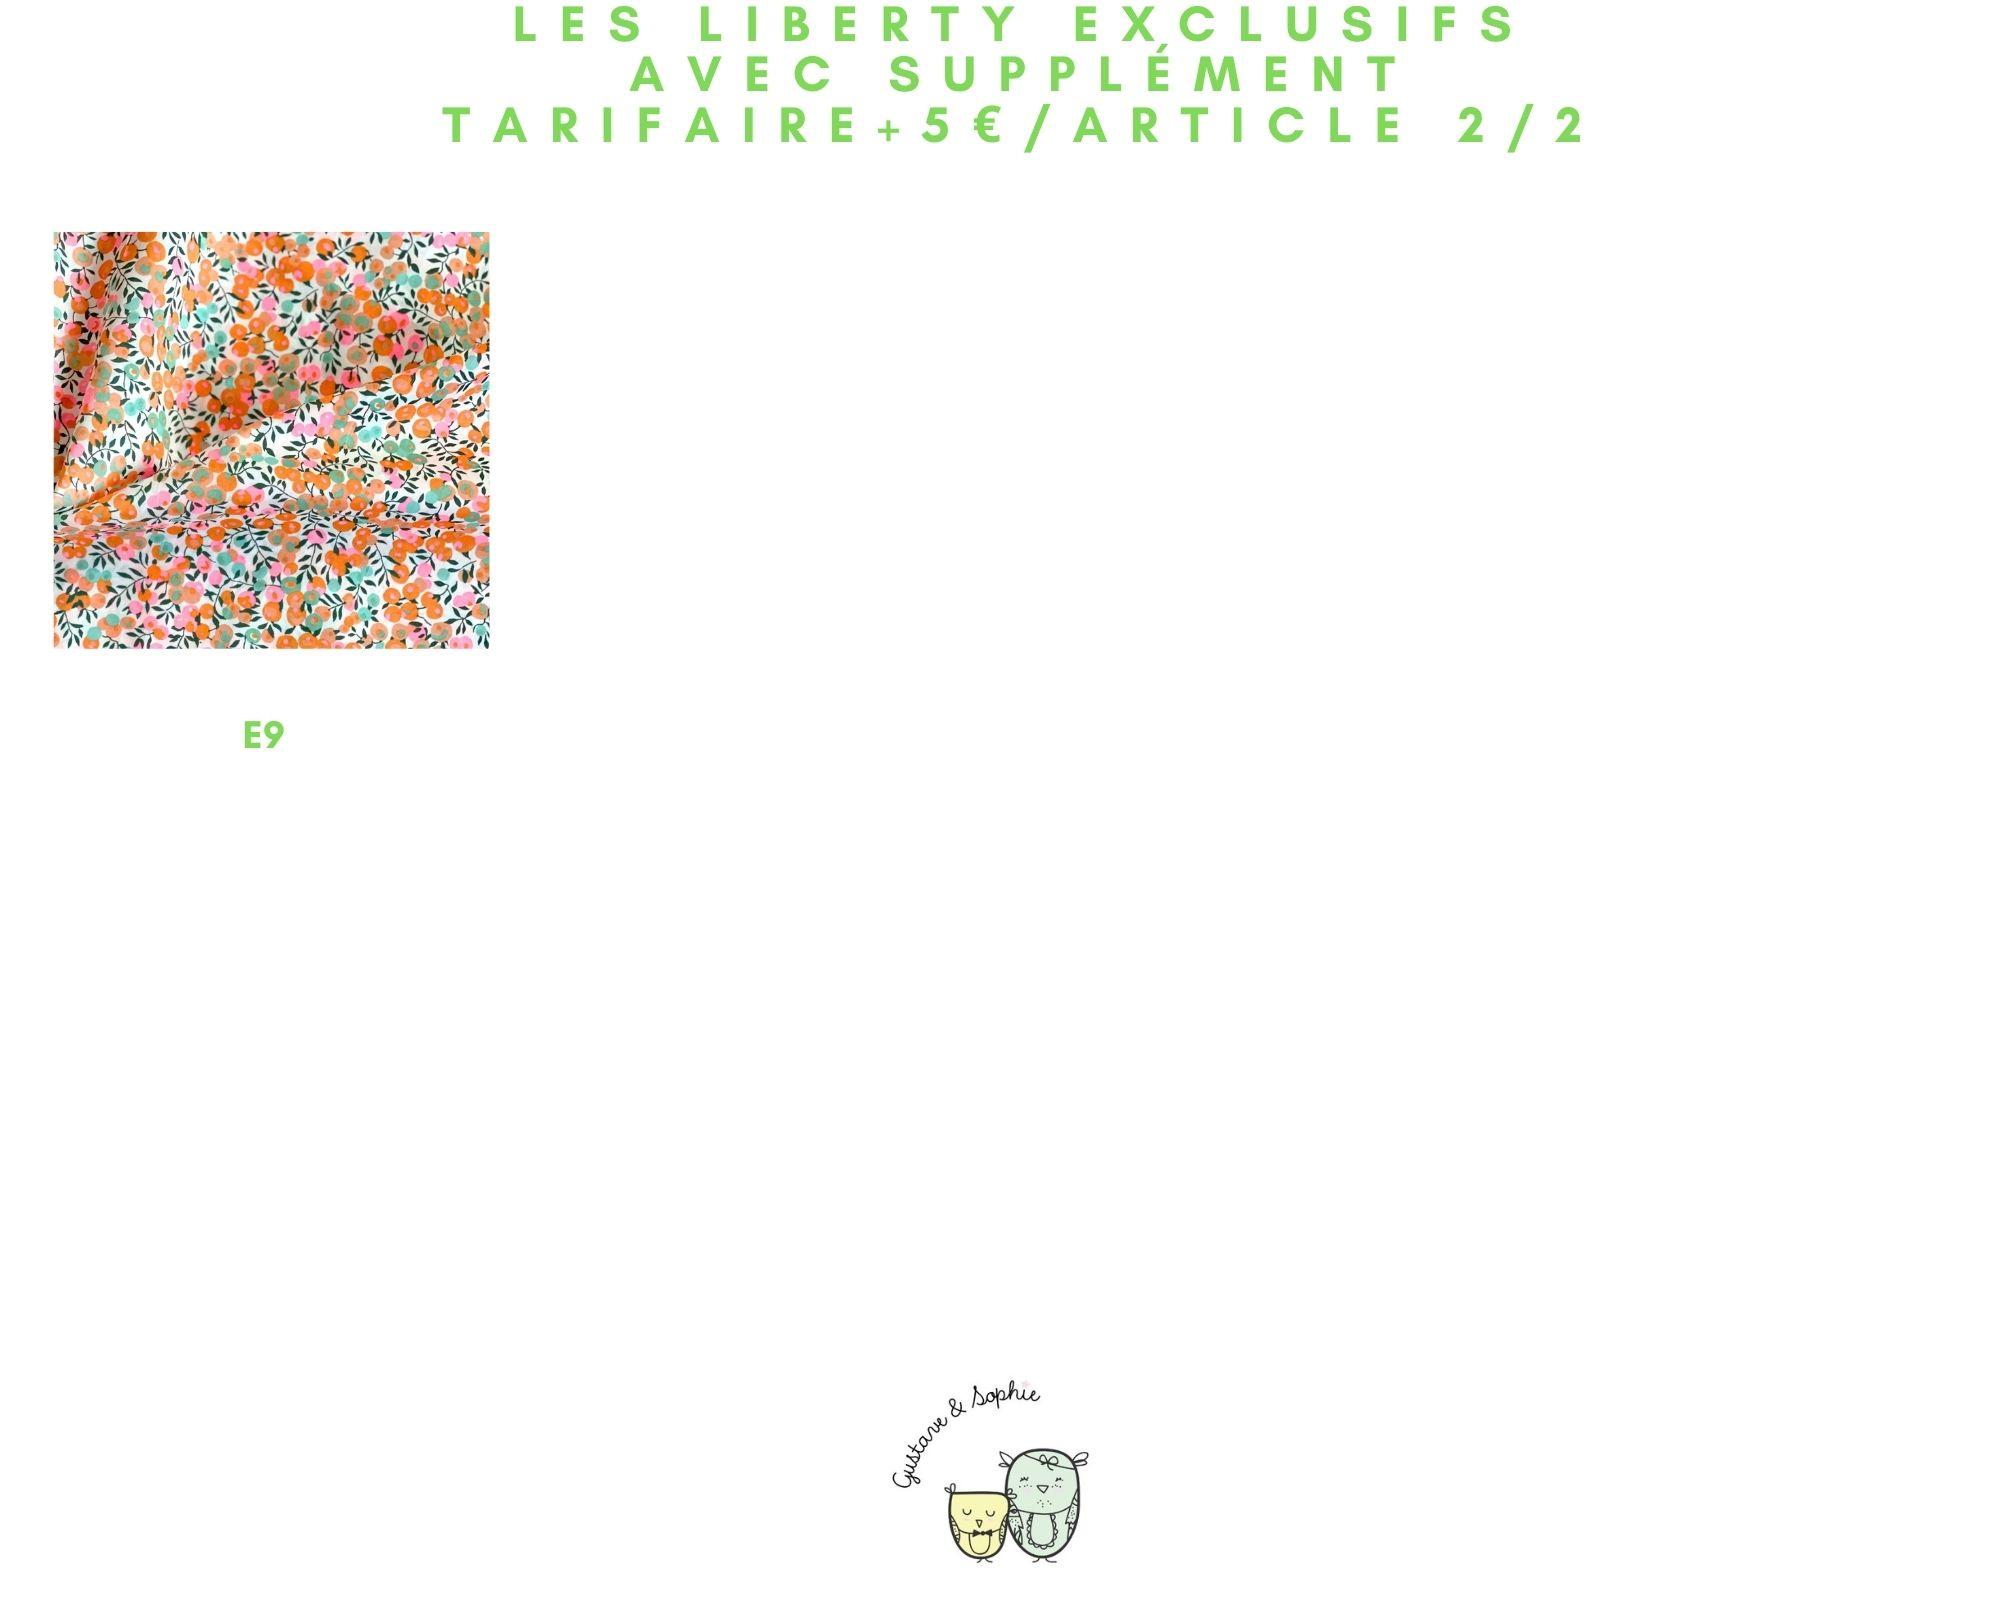 tissu-liberty-unique-exclusif-creation-article-enfant-sur-mesure-personnalisee-liberty-gustavesophie